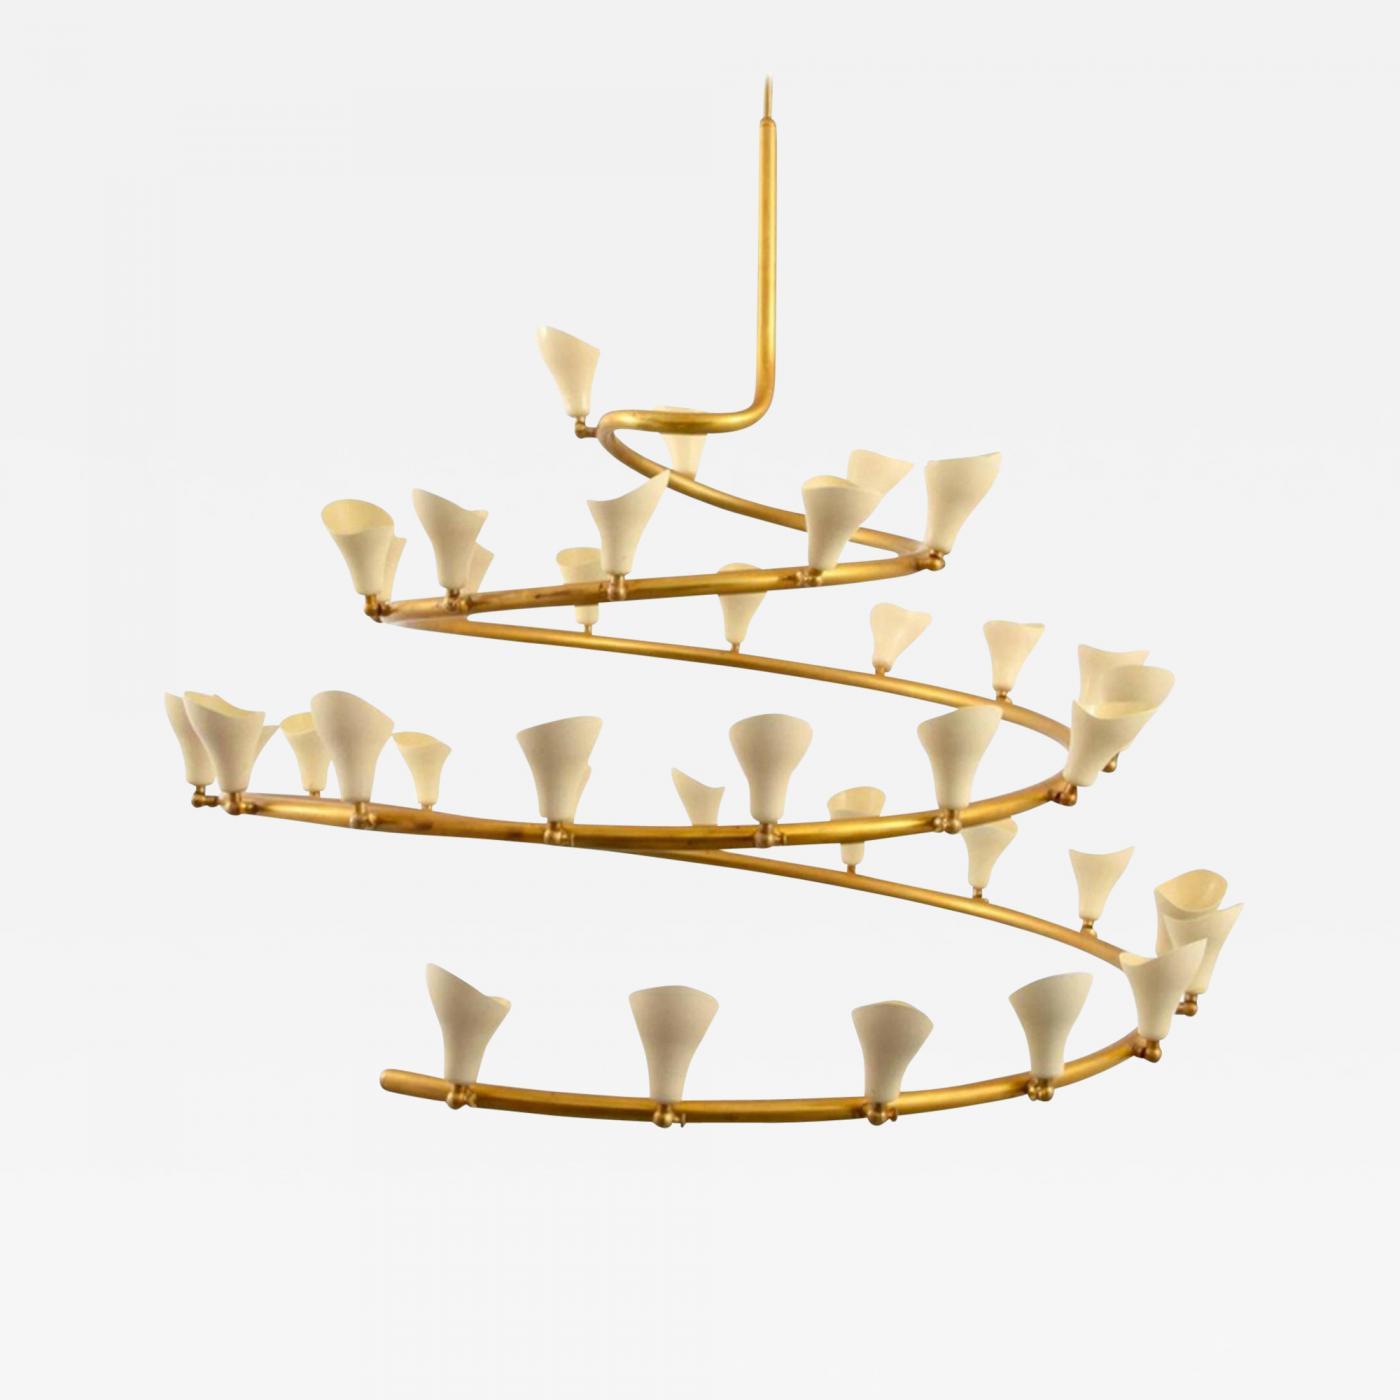 lamp uk football ceiling chandelier metal co aosom homcom sale crystal home summer spiral